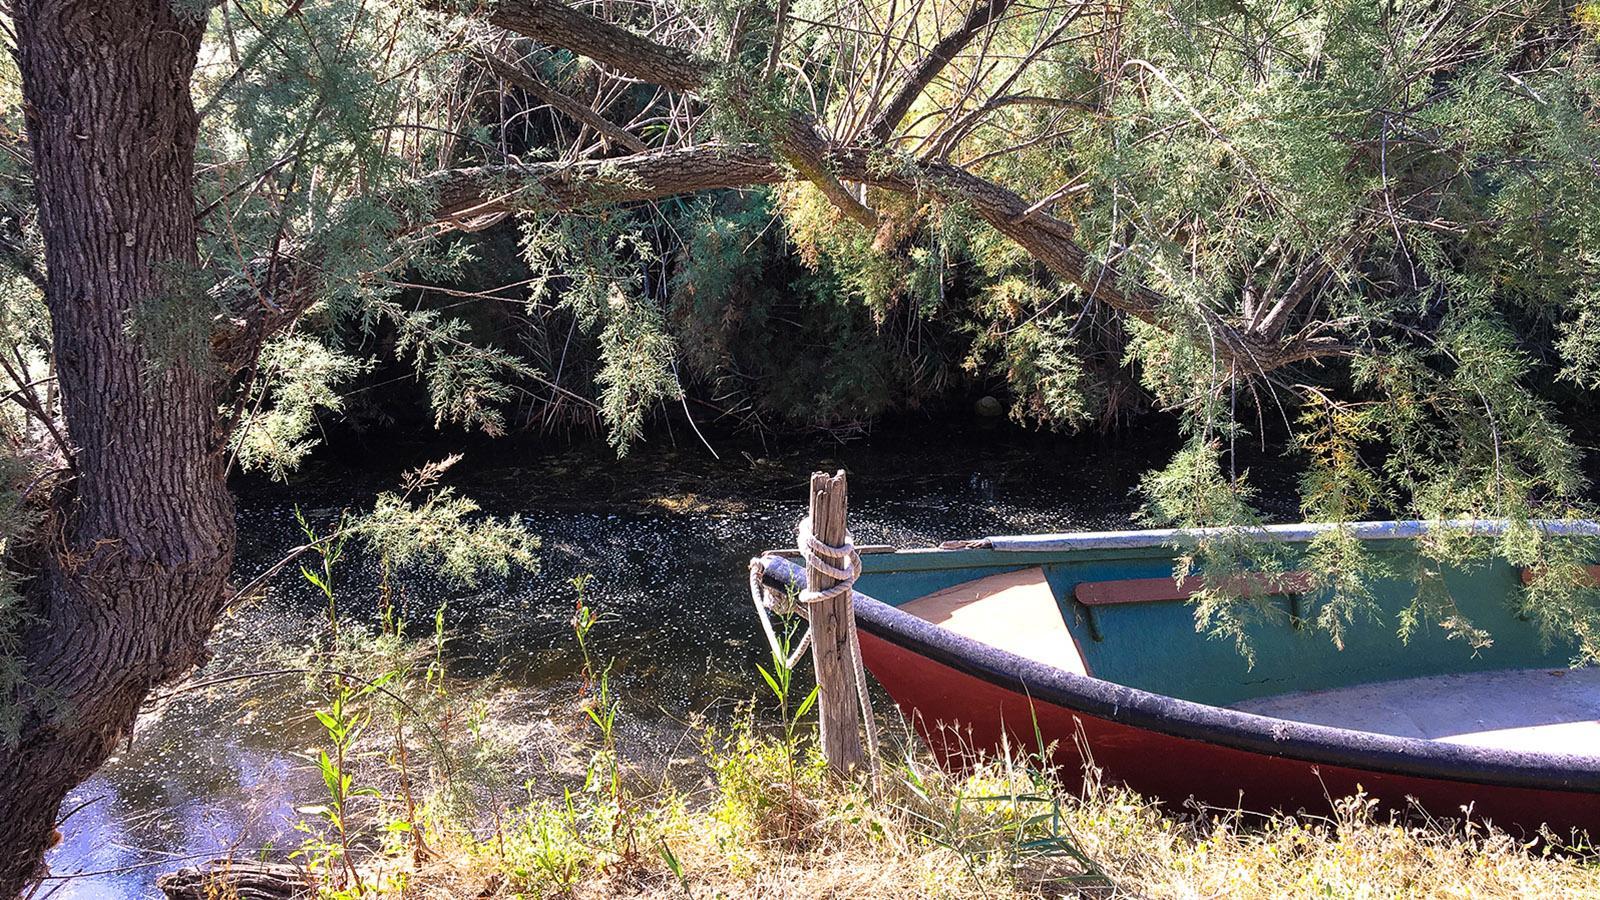 Lagune von Salses-Leucate: Holzkahn am Ufer. Foto: Hilke Maunder